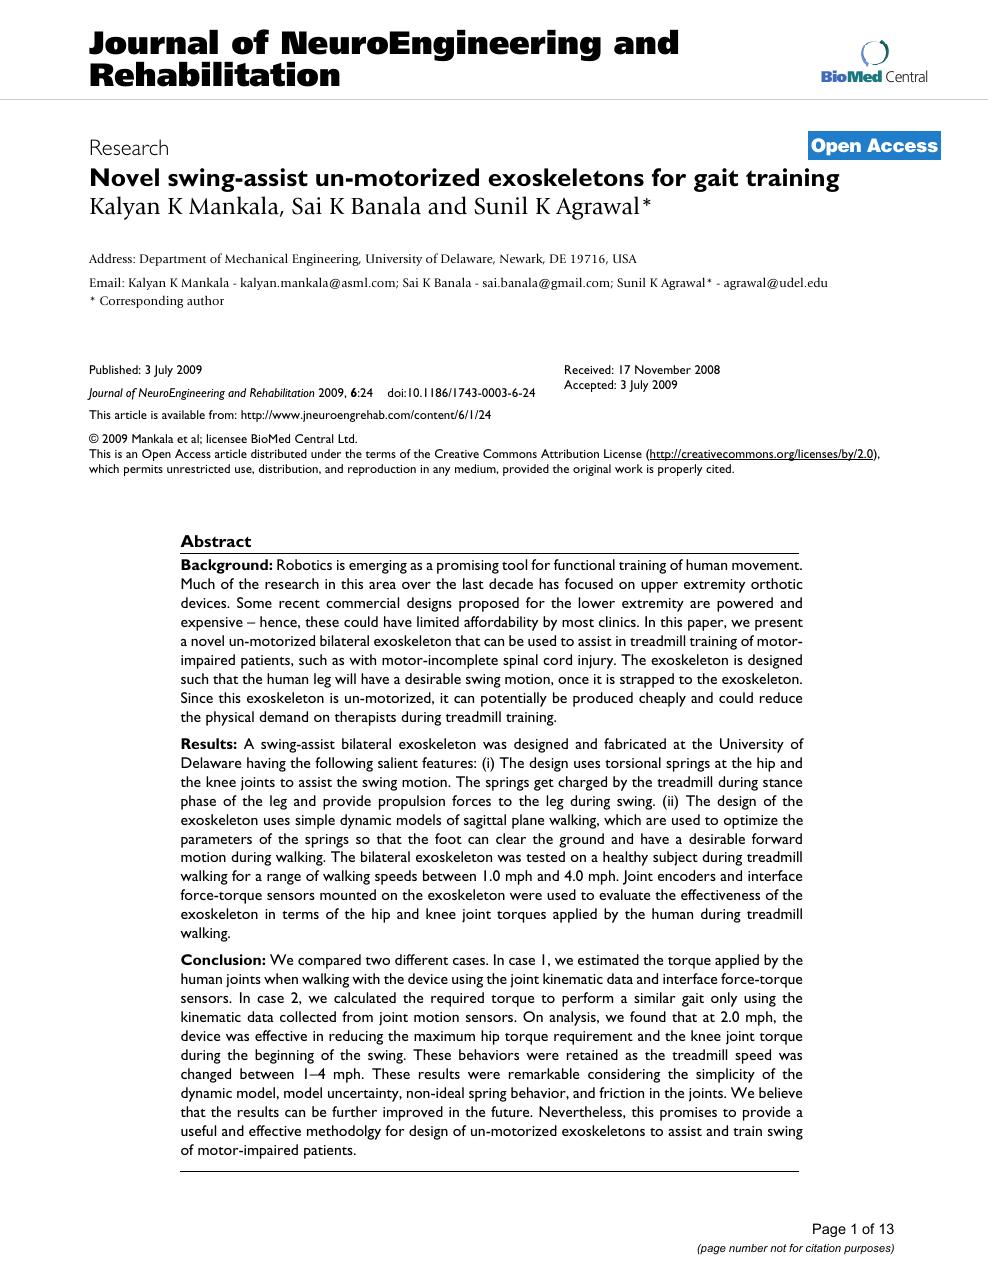 Novel swing-assist un-motorized exoskeletons for gait